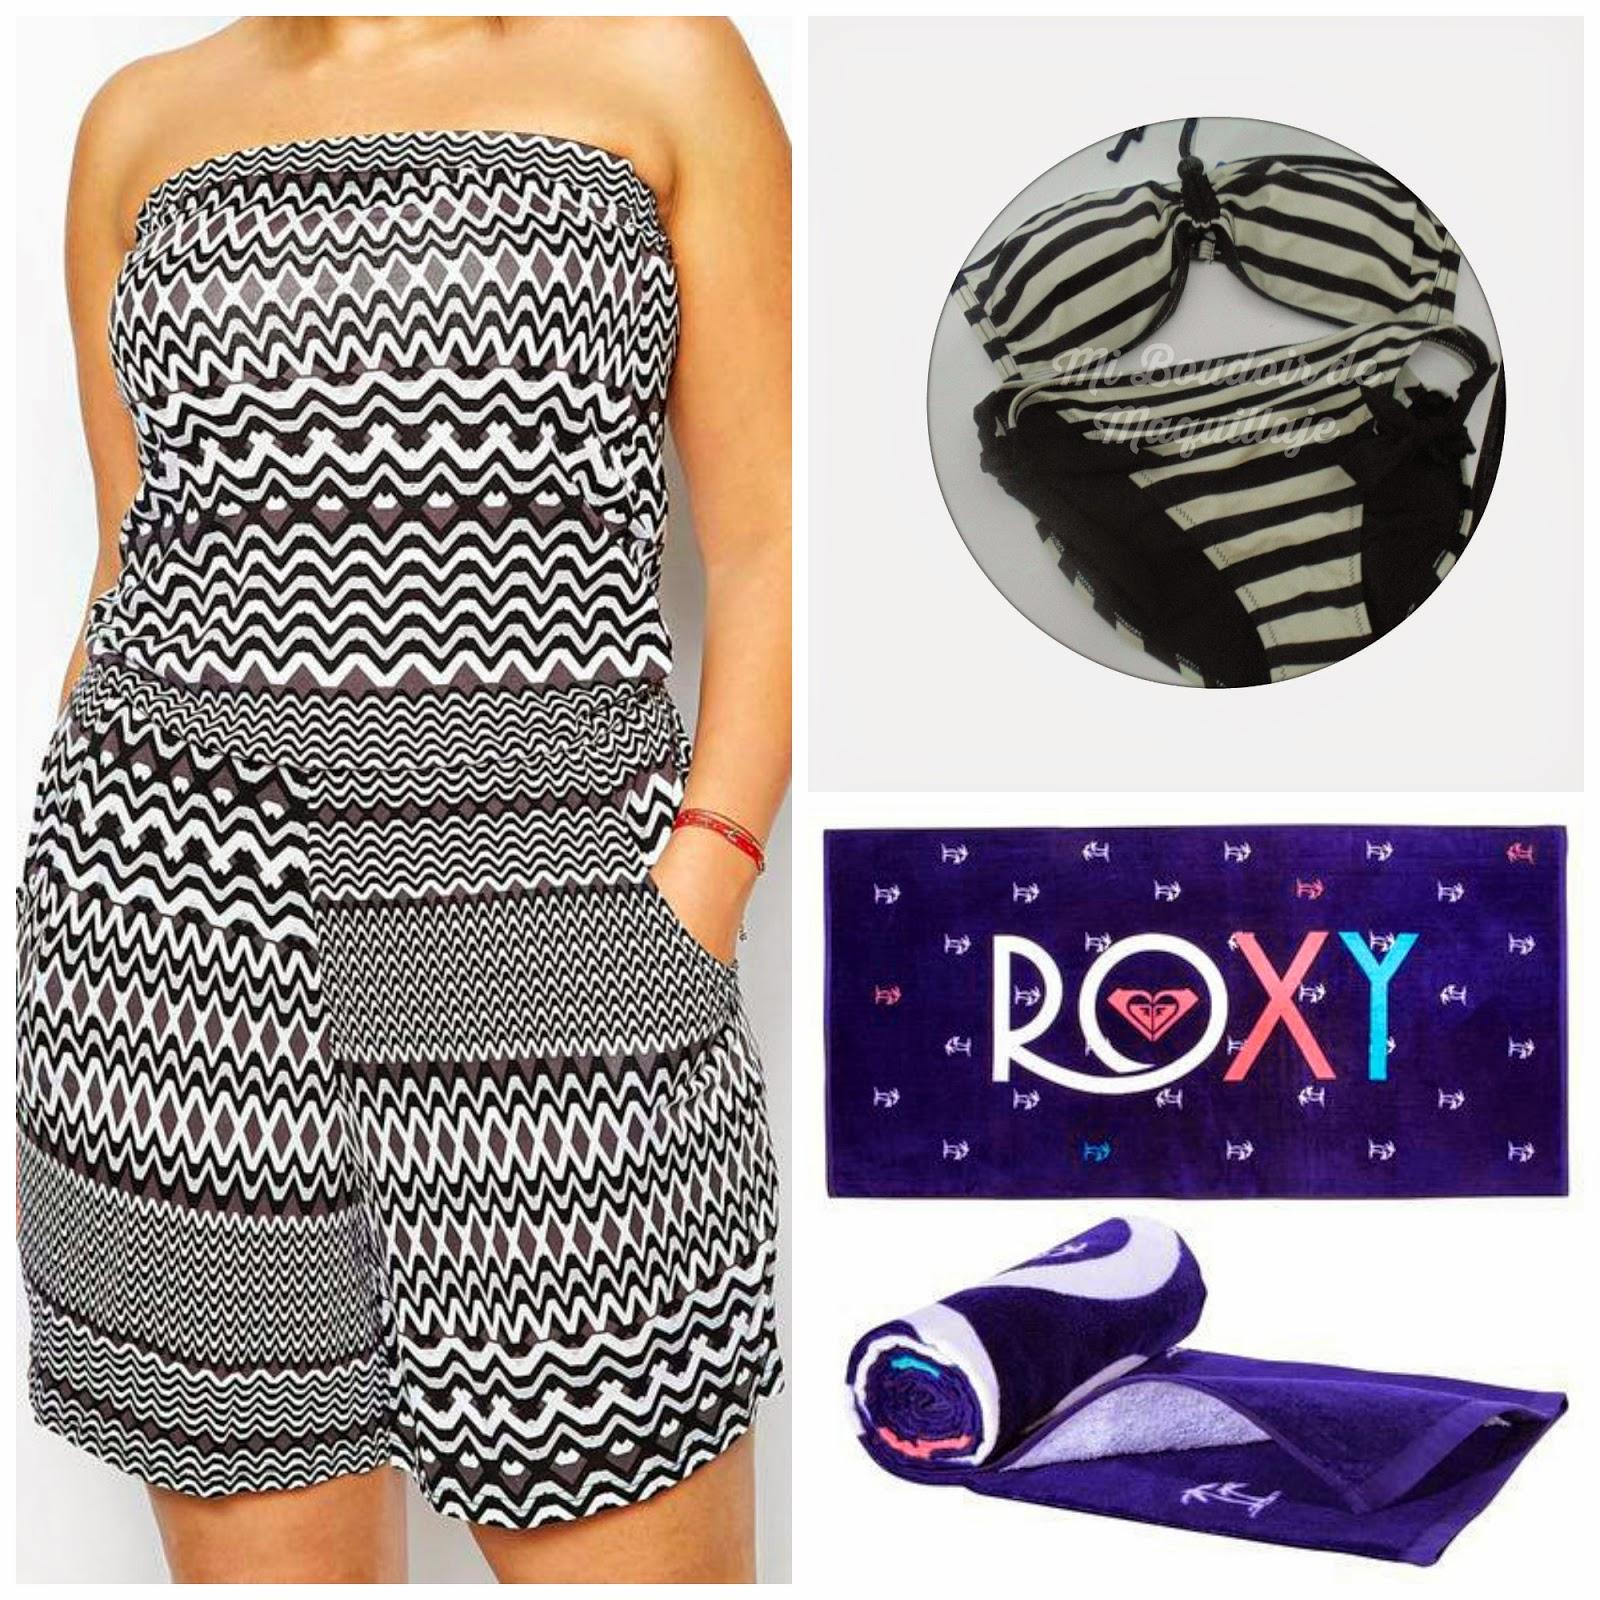 Asos Roxy bikini